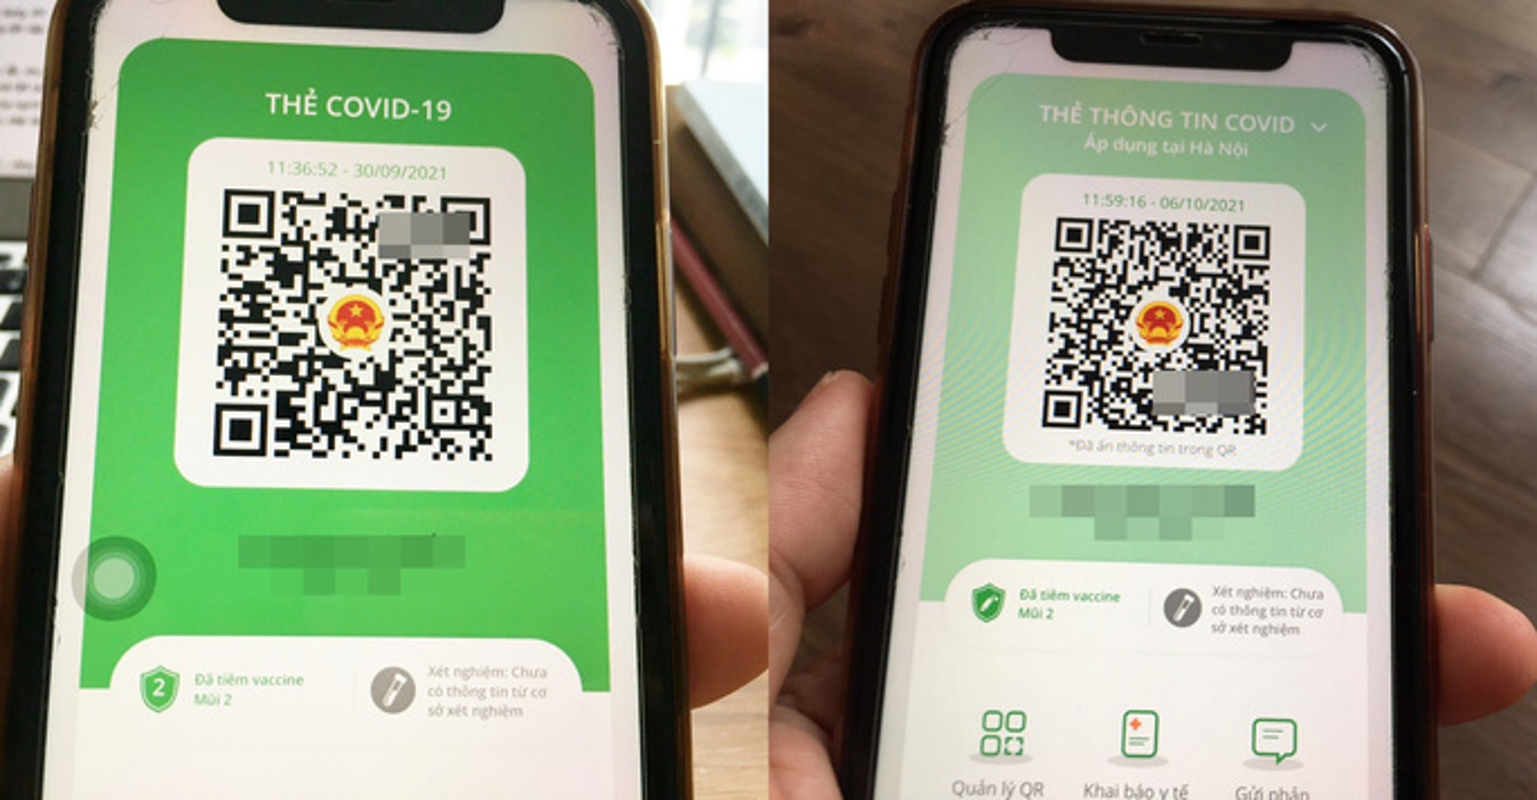 The xanh, vang, do tren app PC-COVID co y nghia gi?-Hinh-4